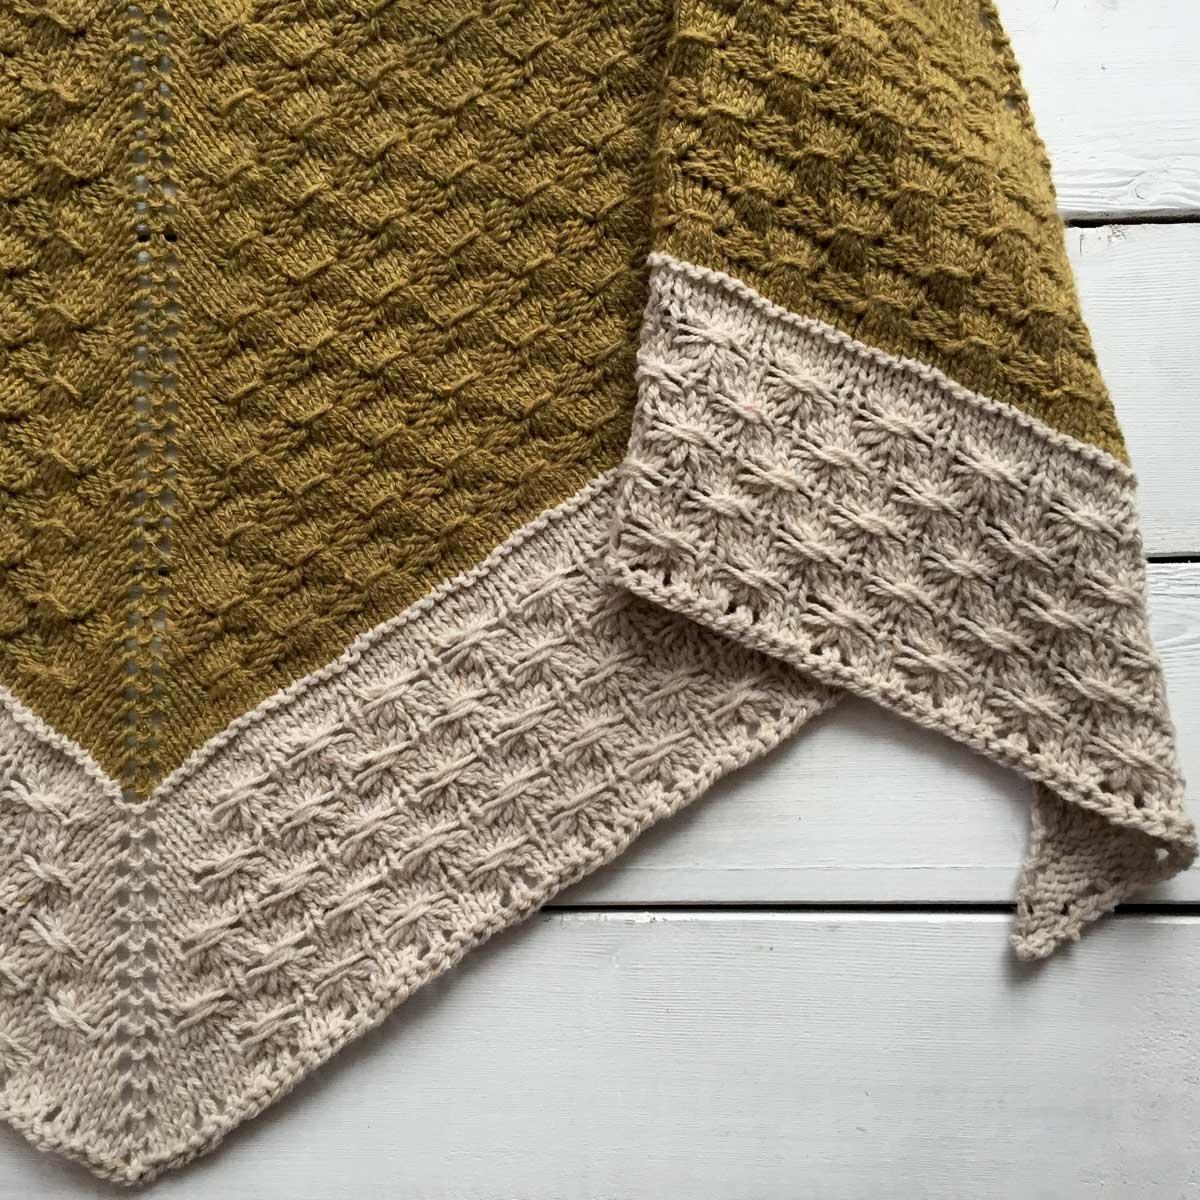 Amberle Shawl Pattern by Shannon Cook of VeryShannon.com #amberleshawl